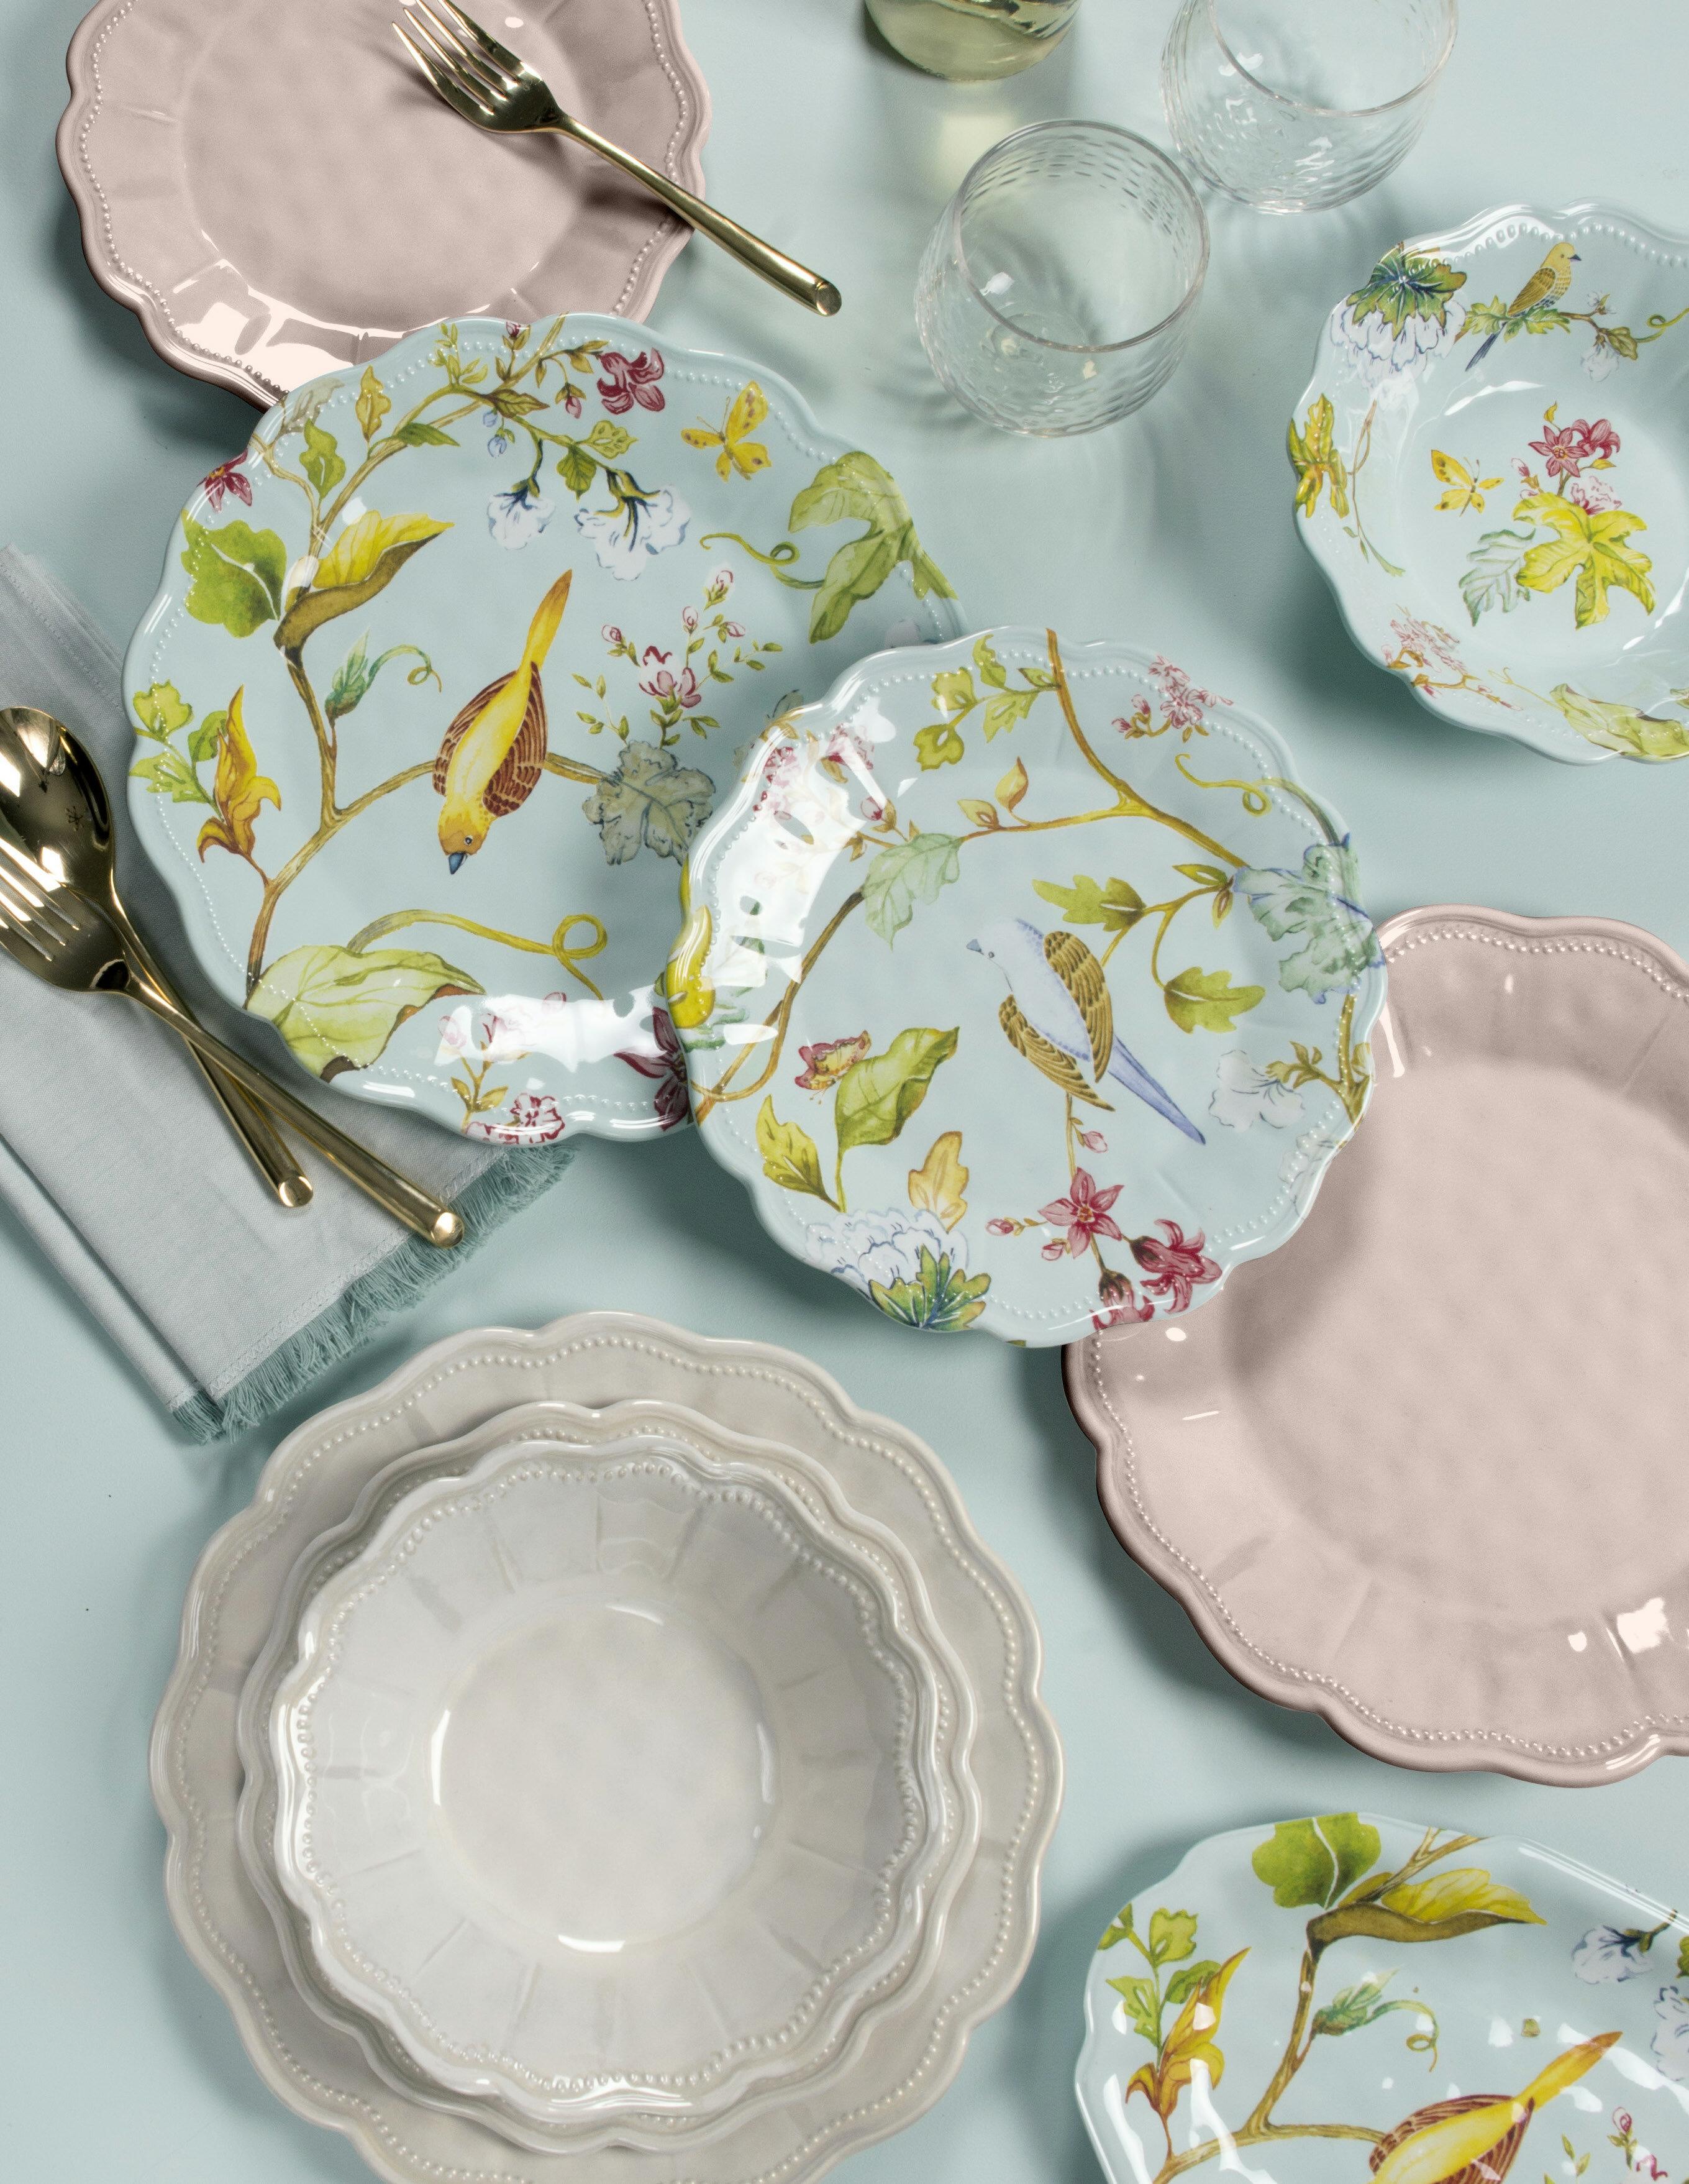 Lecroy Spring Chinoiserie 12 Piece Melamine Dinnerware Set, Service for 4 &  Reviews | Wayfair